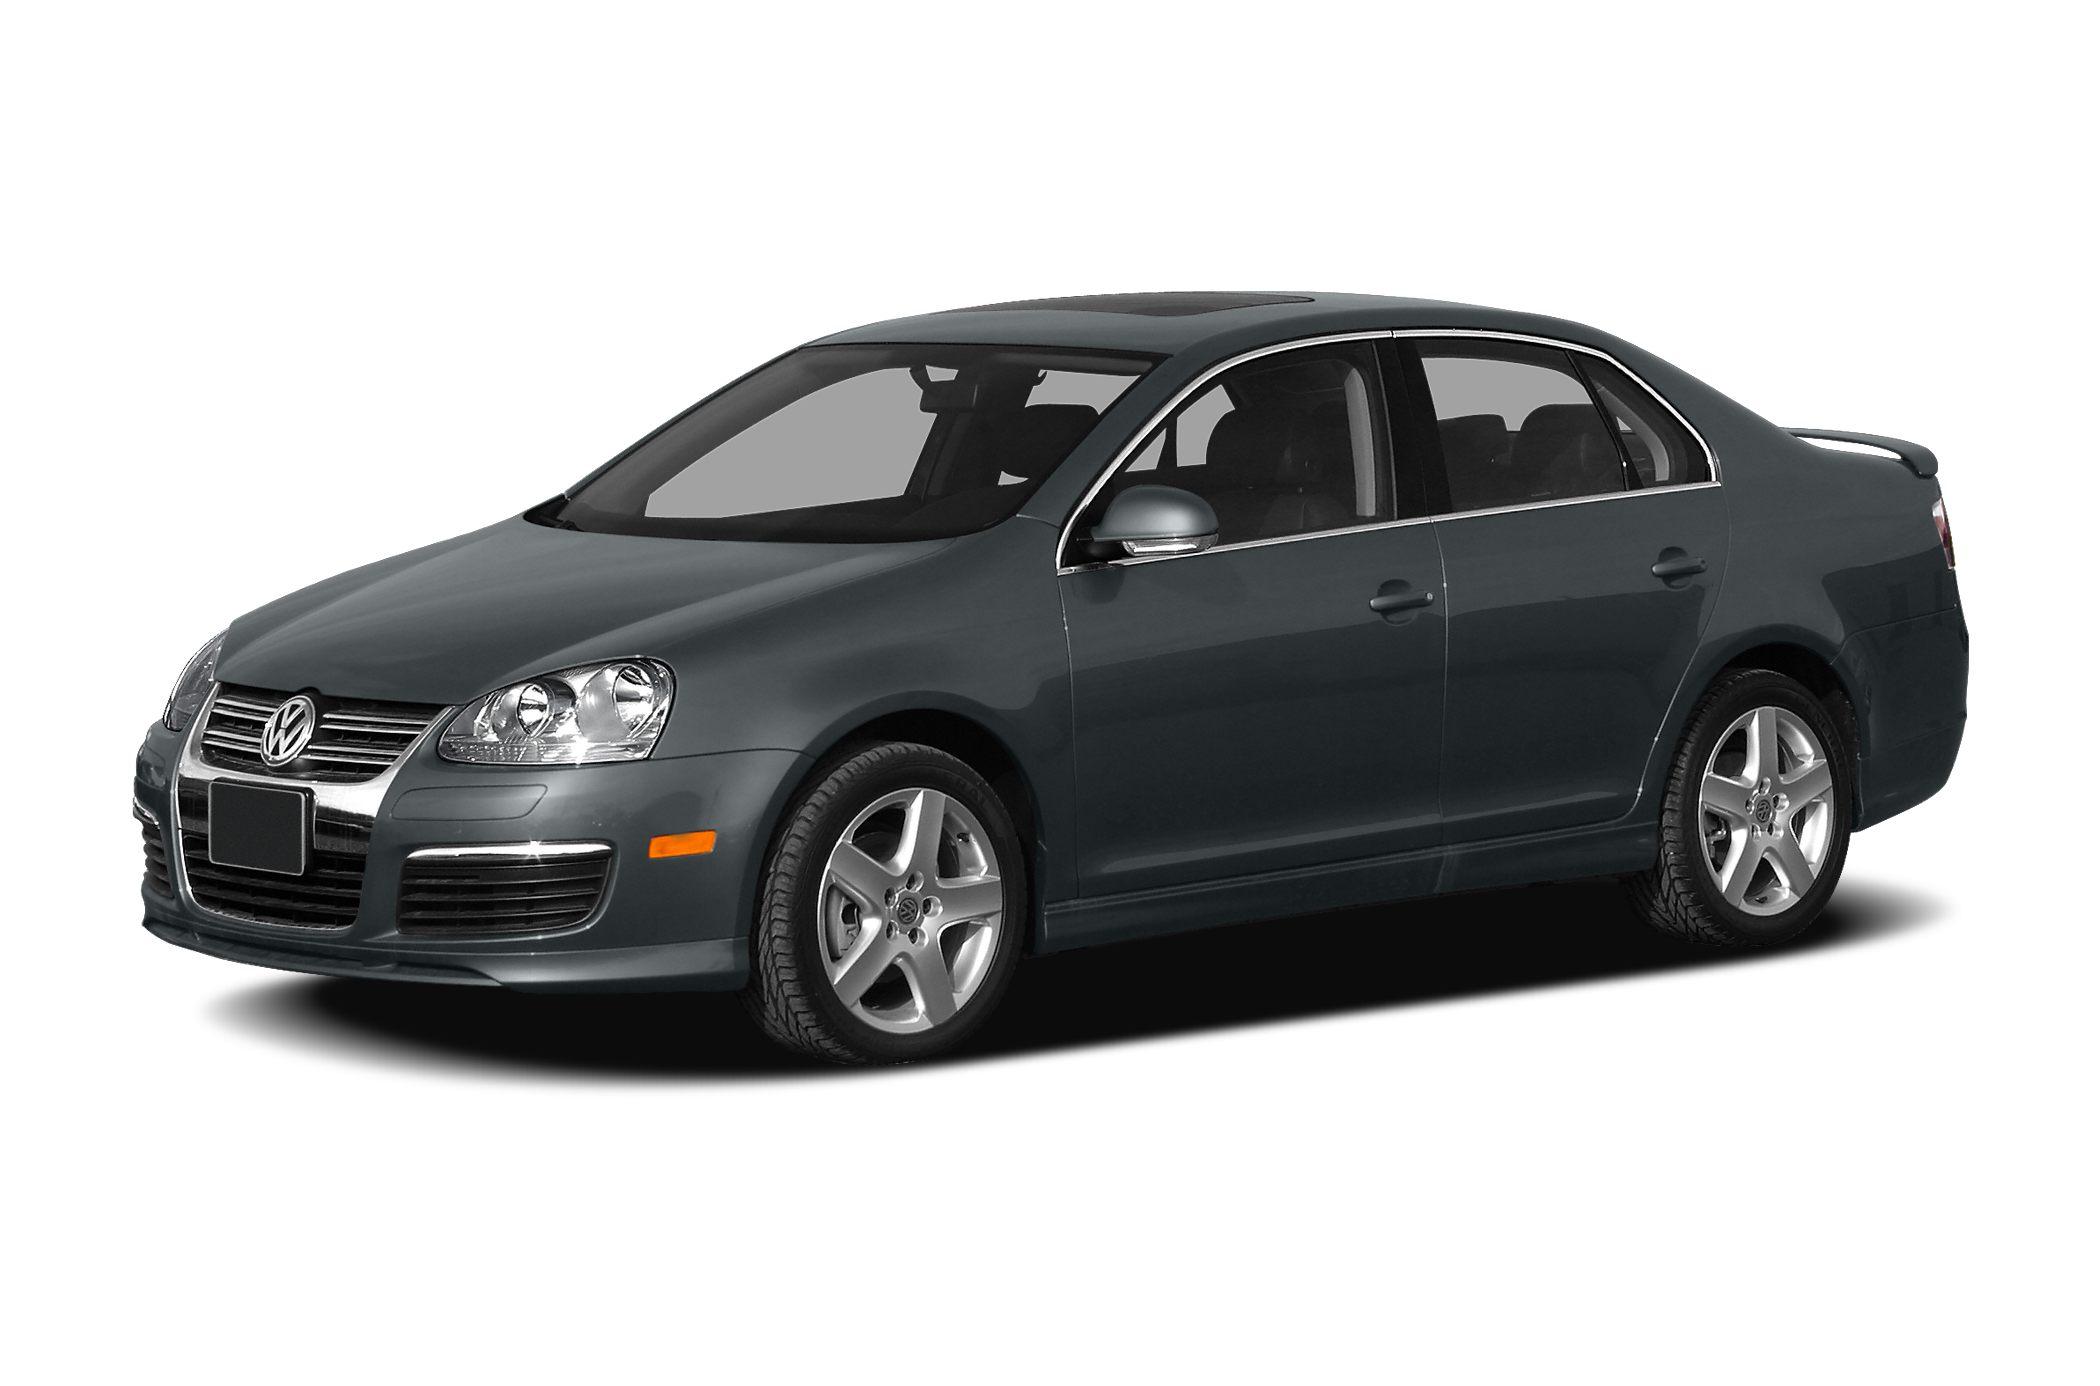 2009 Volkswagen Jetta Wolfsburg Edition Sedan for sale in Houston for $9,877 with 80,499 miles